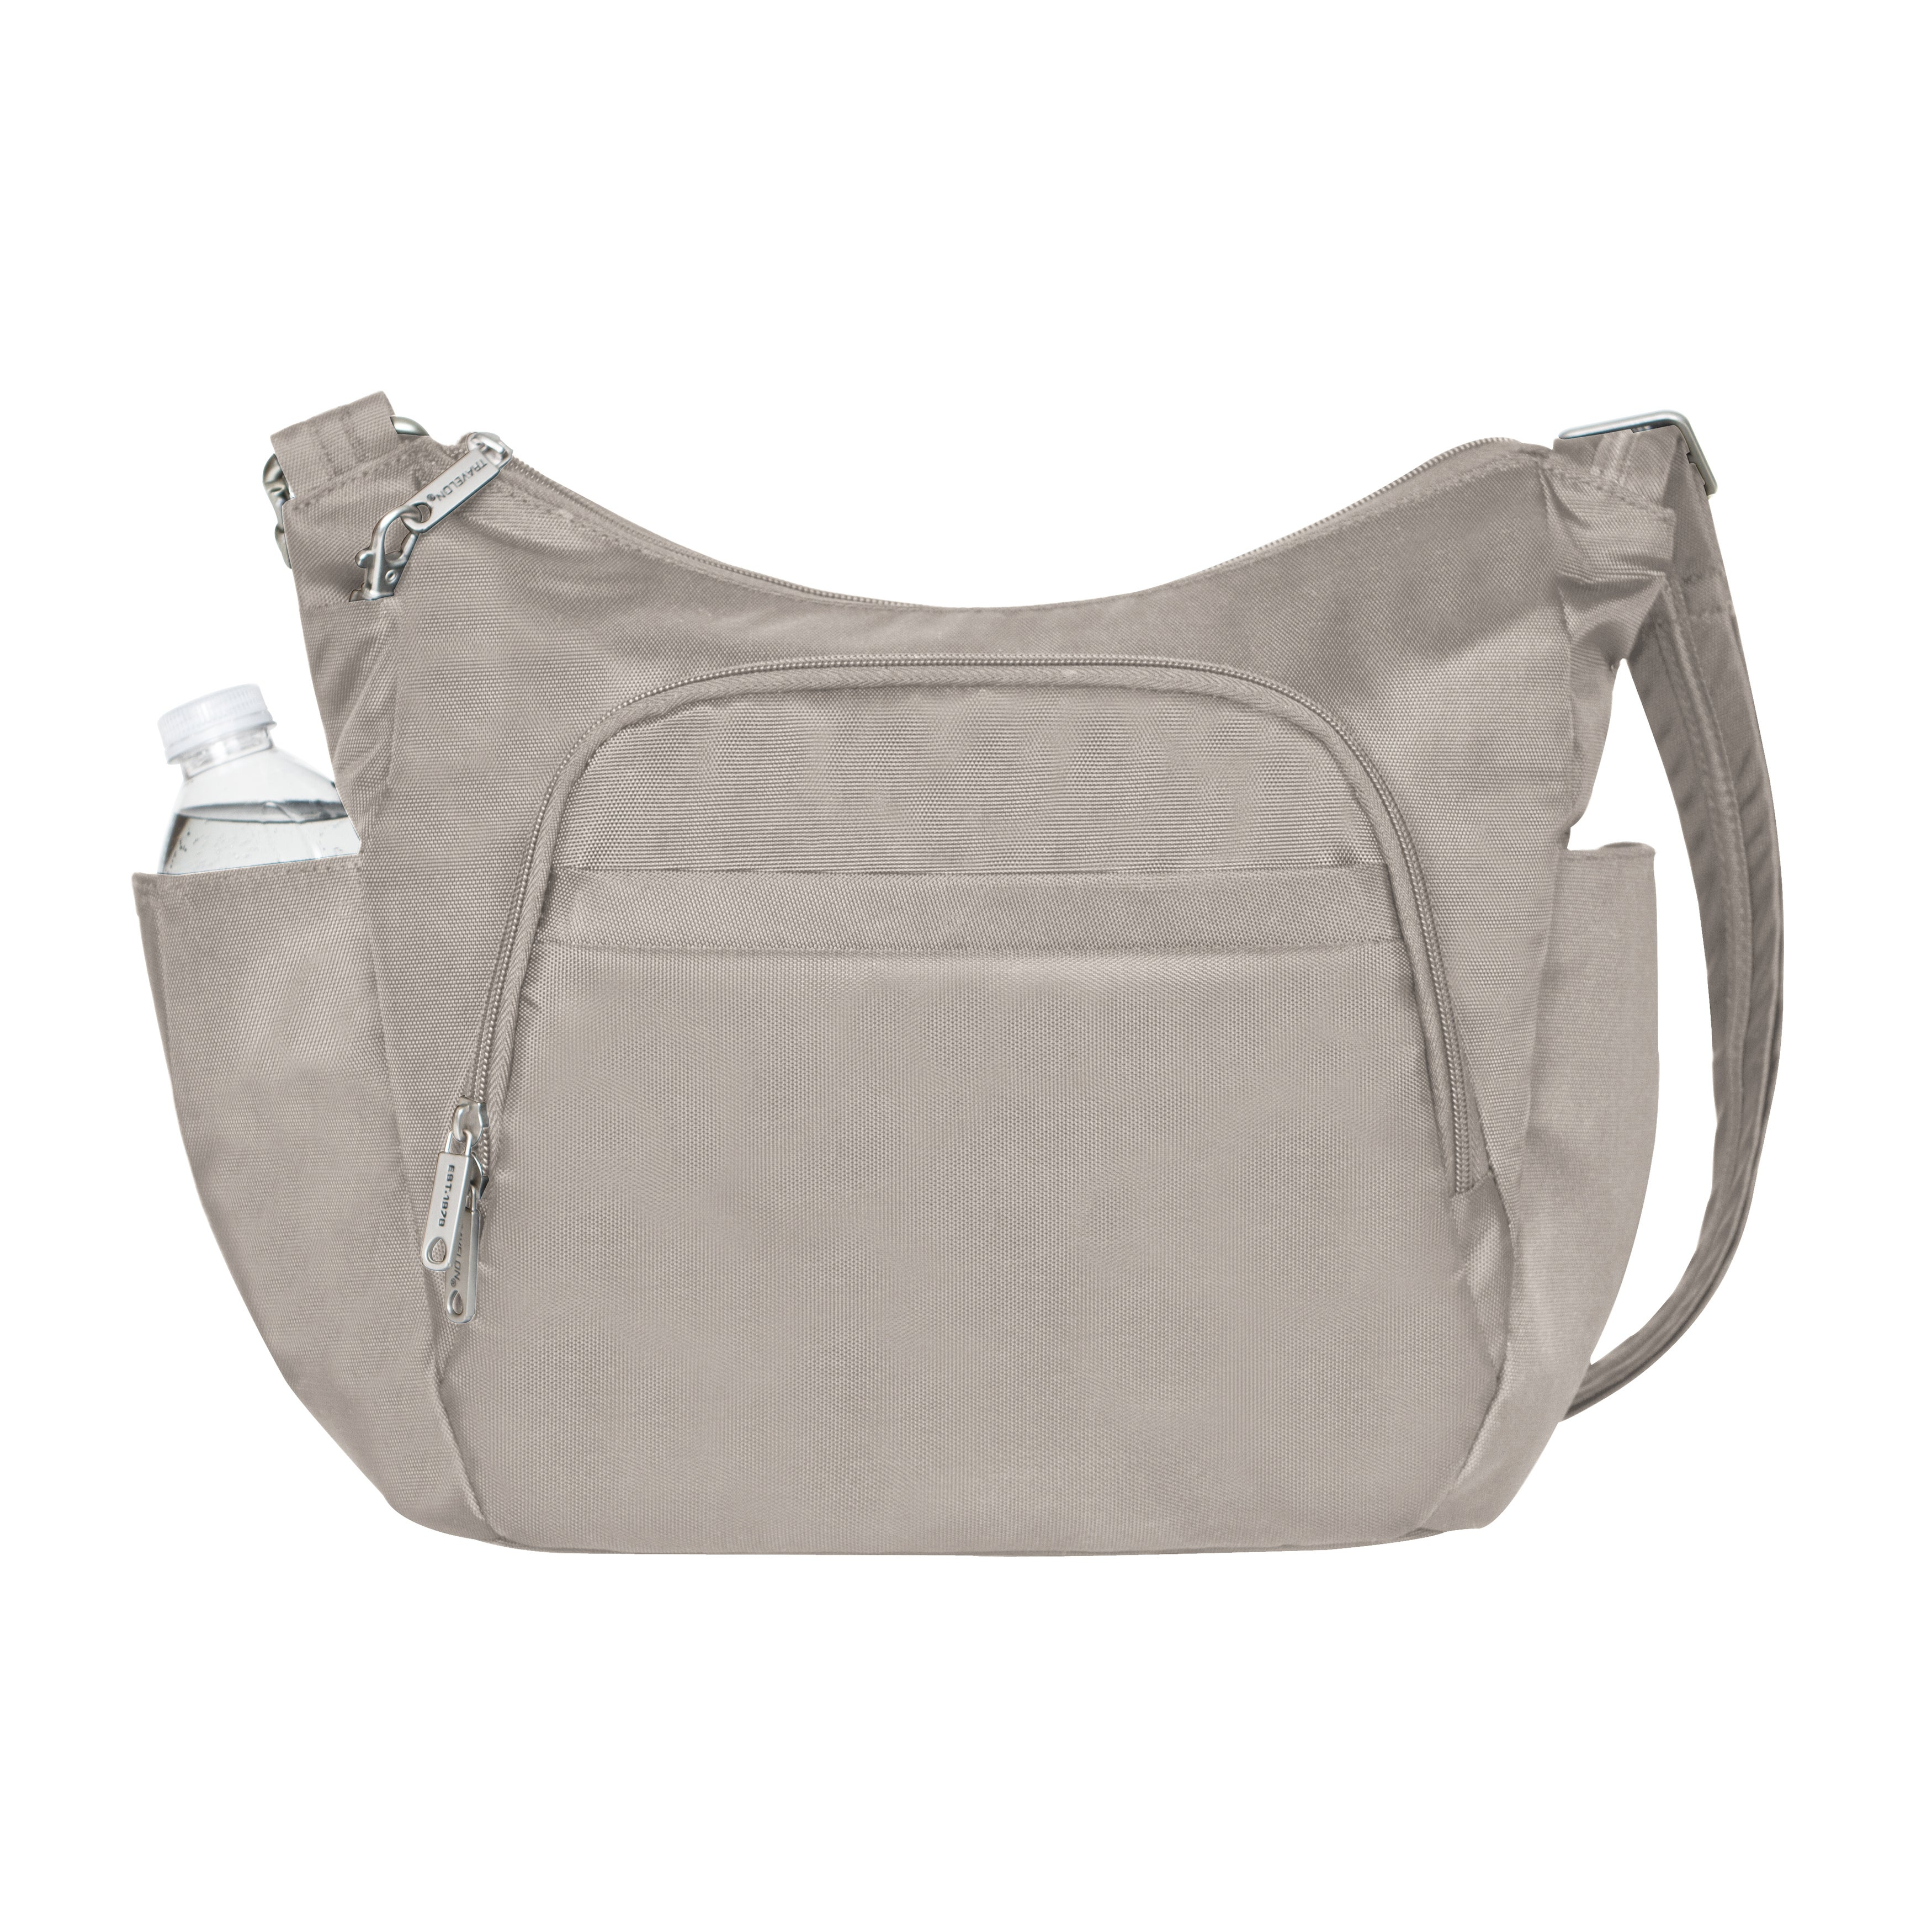 636196cc4cb5 Travelon Anti-theft Classic Cross-body Bucket Bag